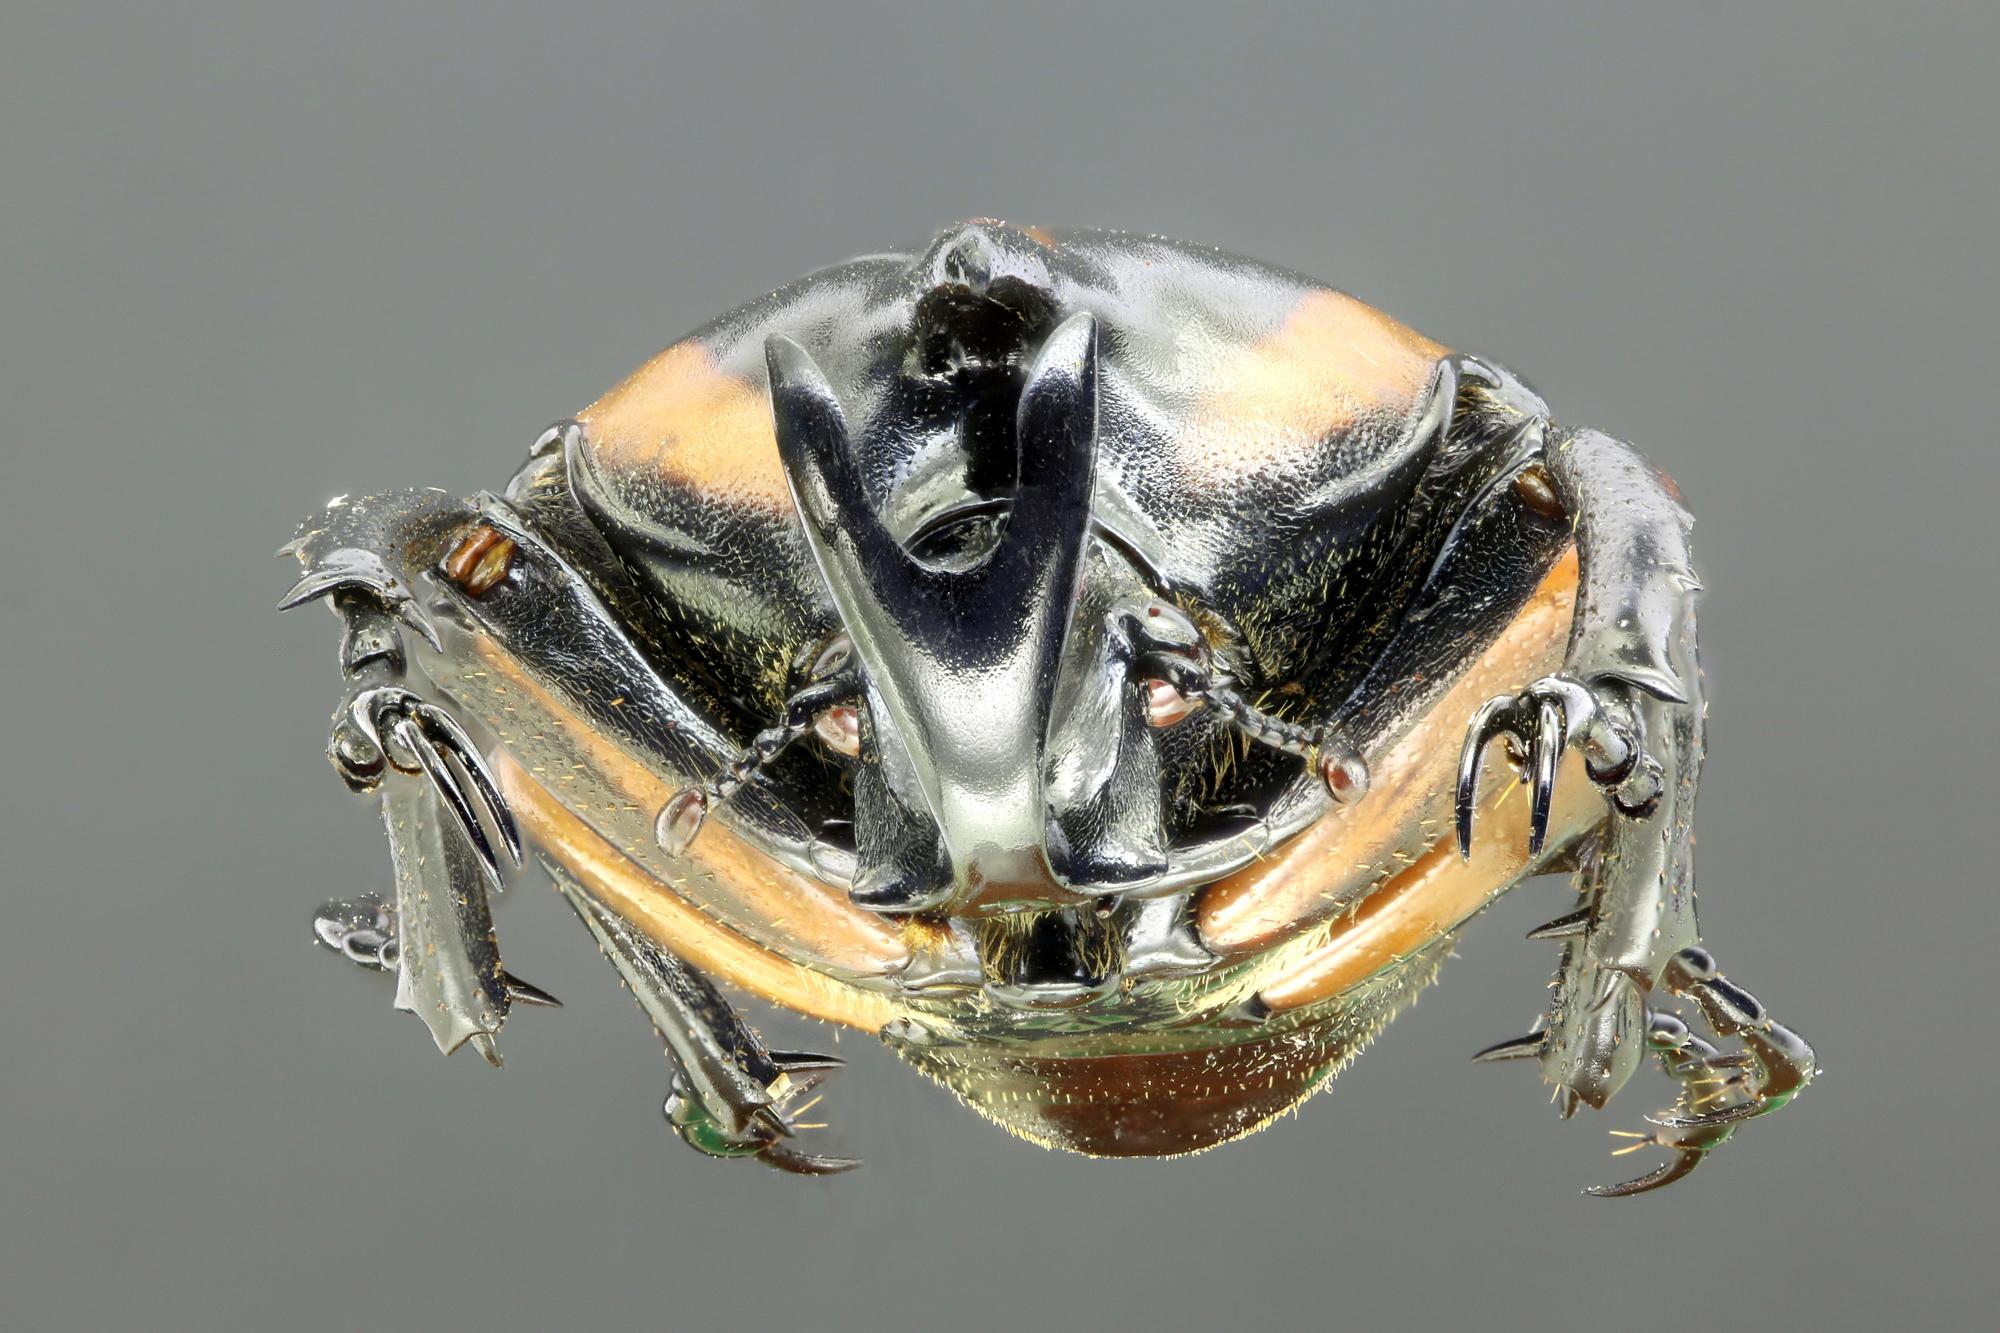 Neophaedimus auzouxi 66396zs33.jpg